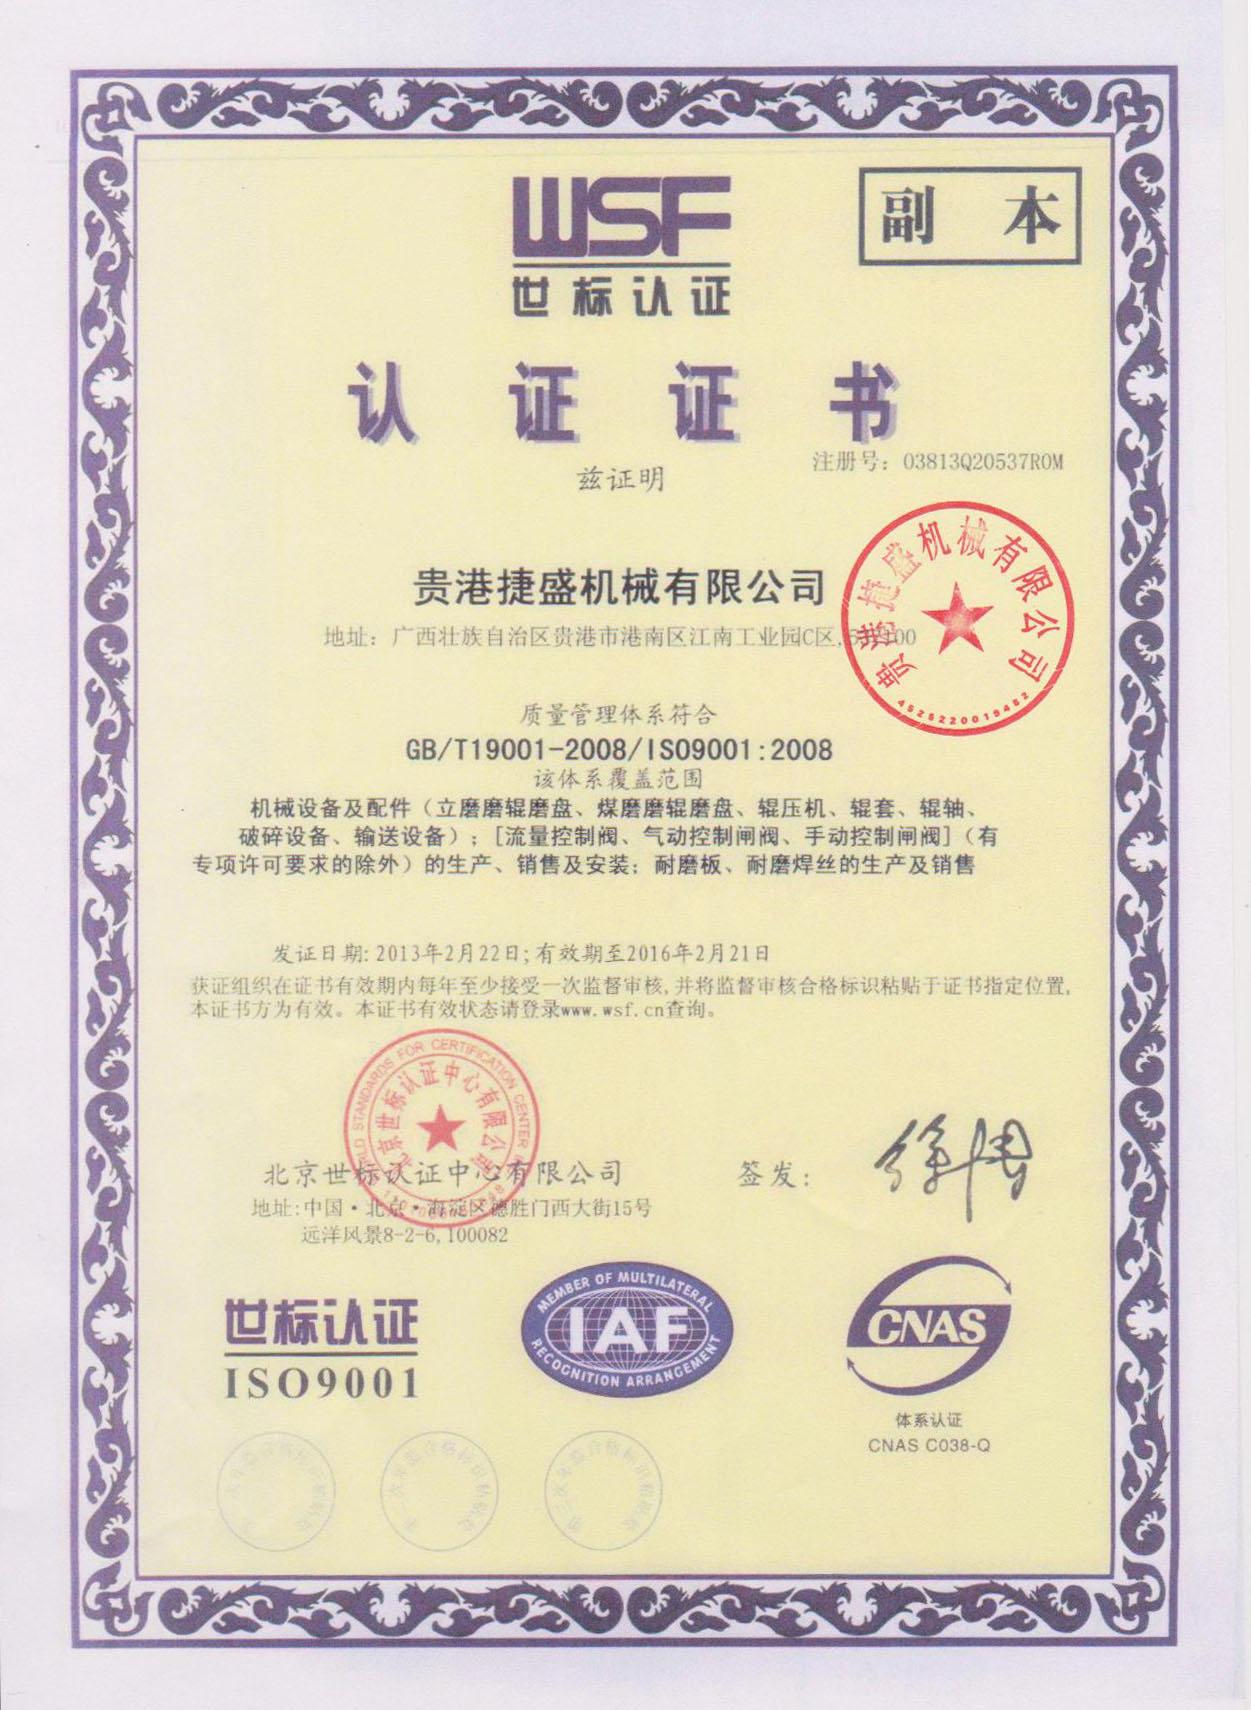 IS09001质量管理体系认证